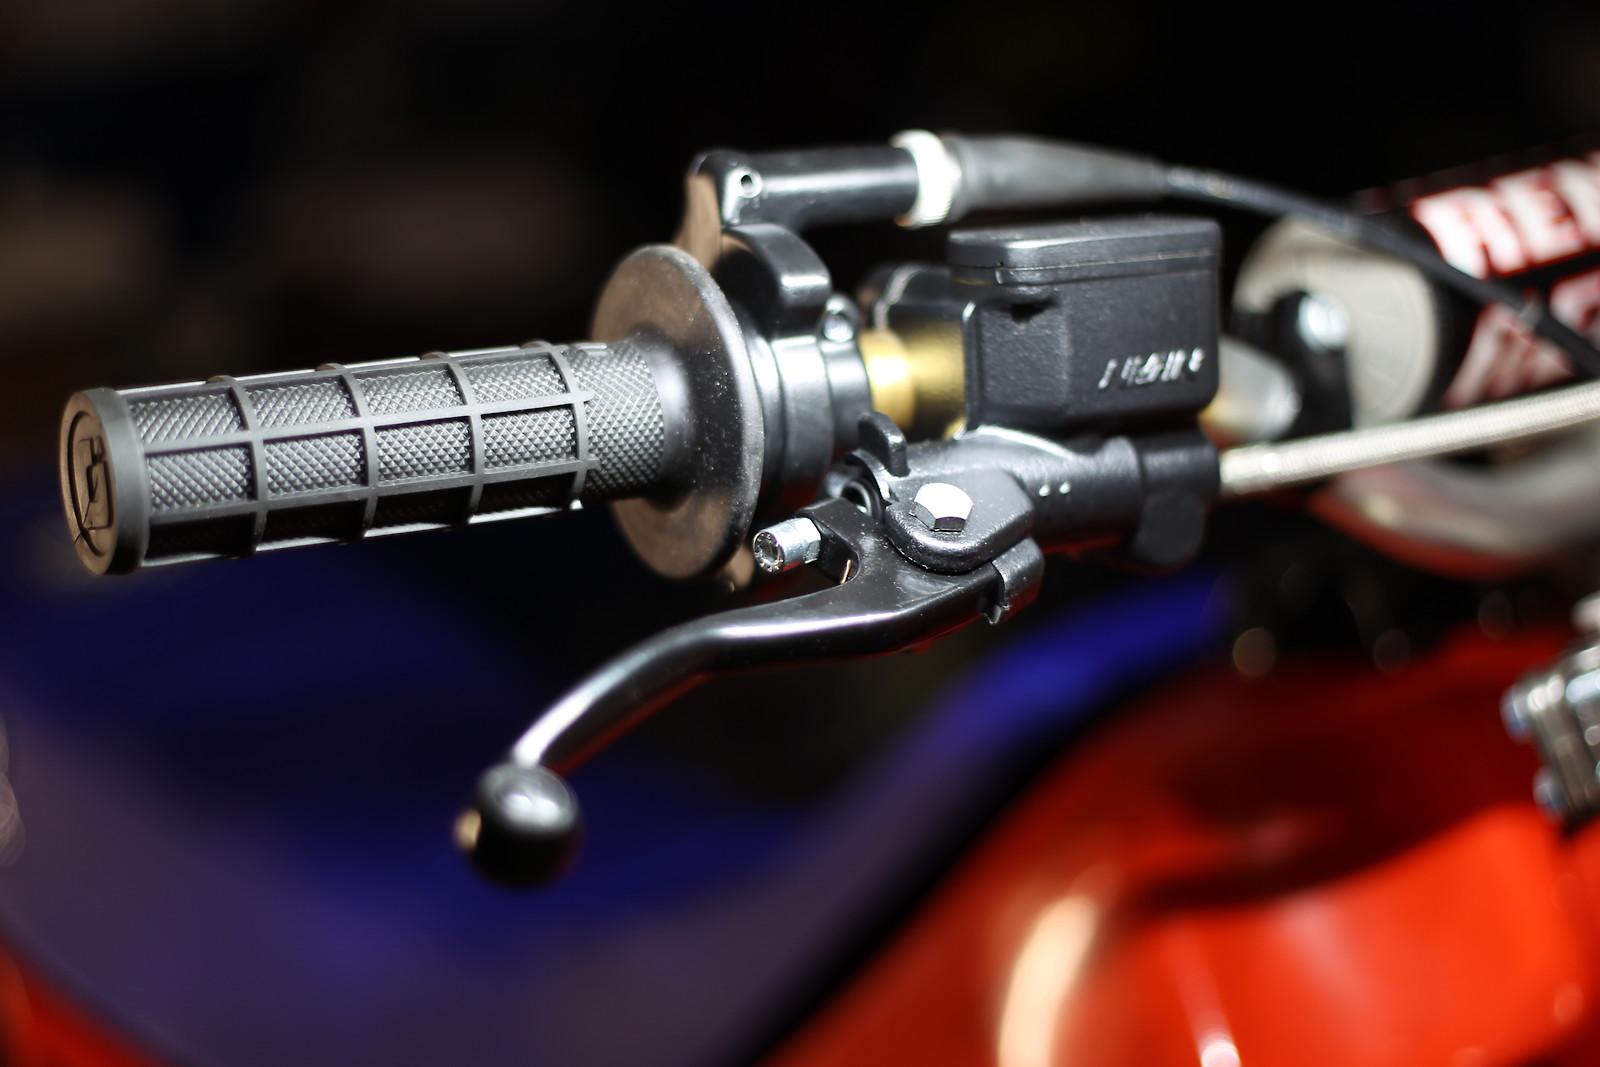 CN9Z5477 - Diego Kawi Rider - Motocross Pictures - Vital MX